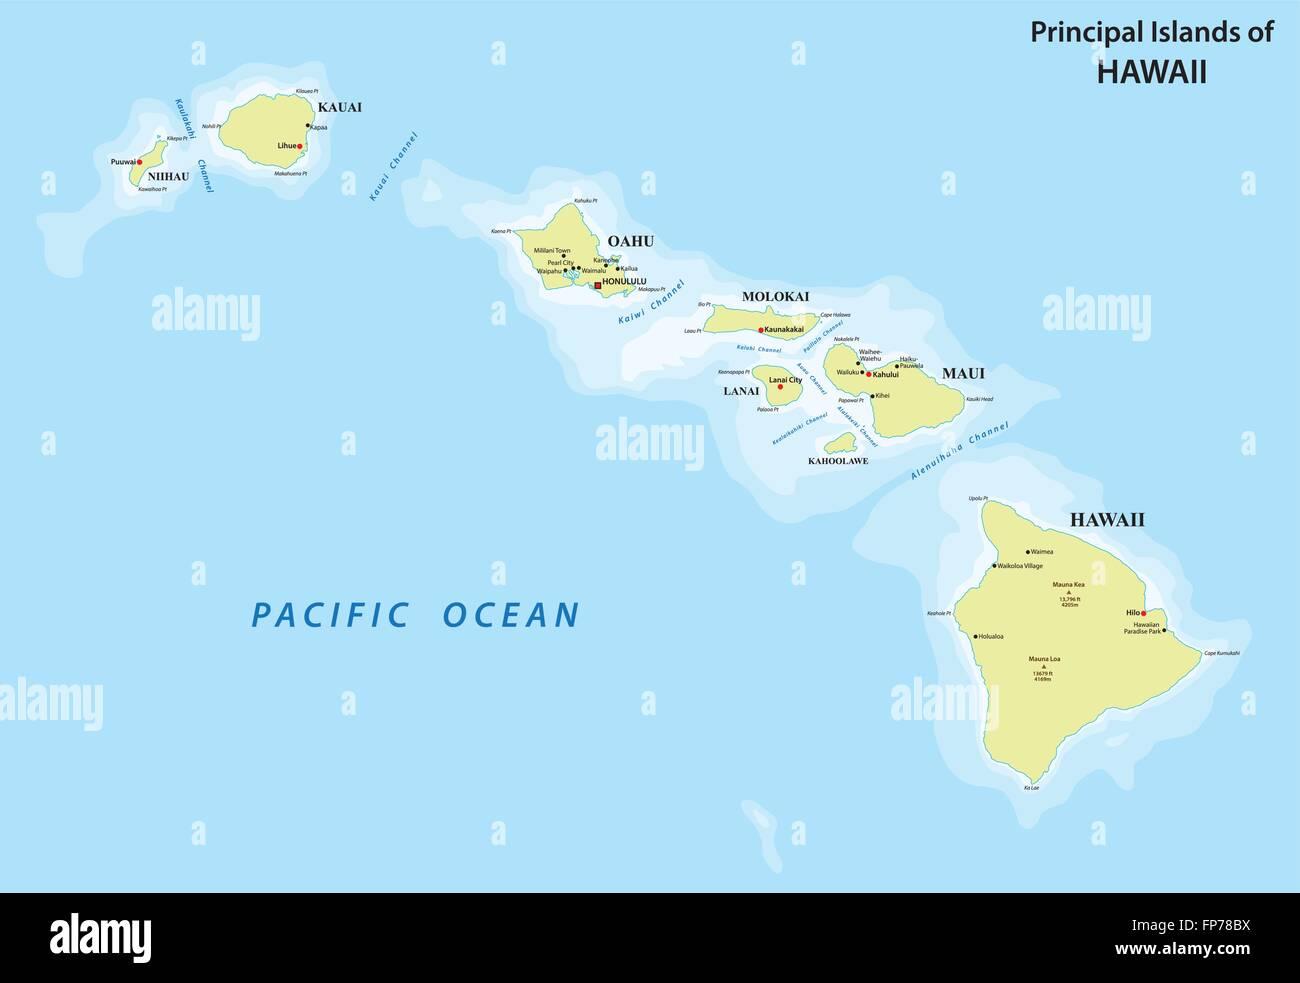 Hawaii Map Stock Vector Art Illustration Vector Image 99734542